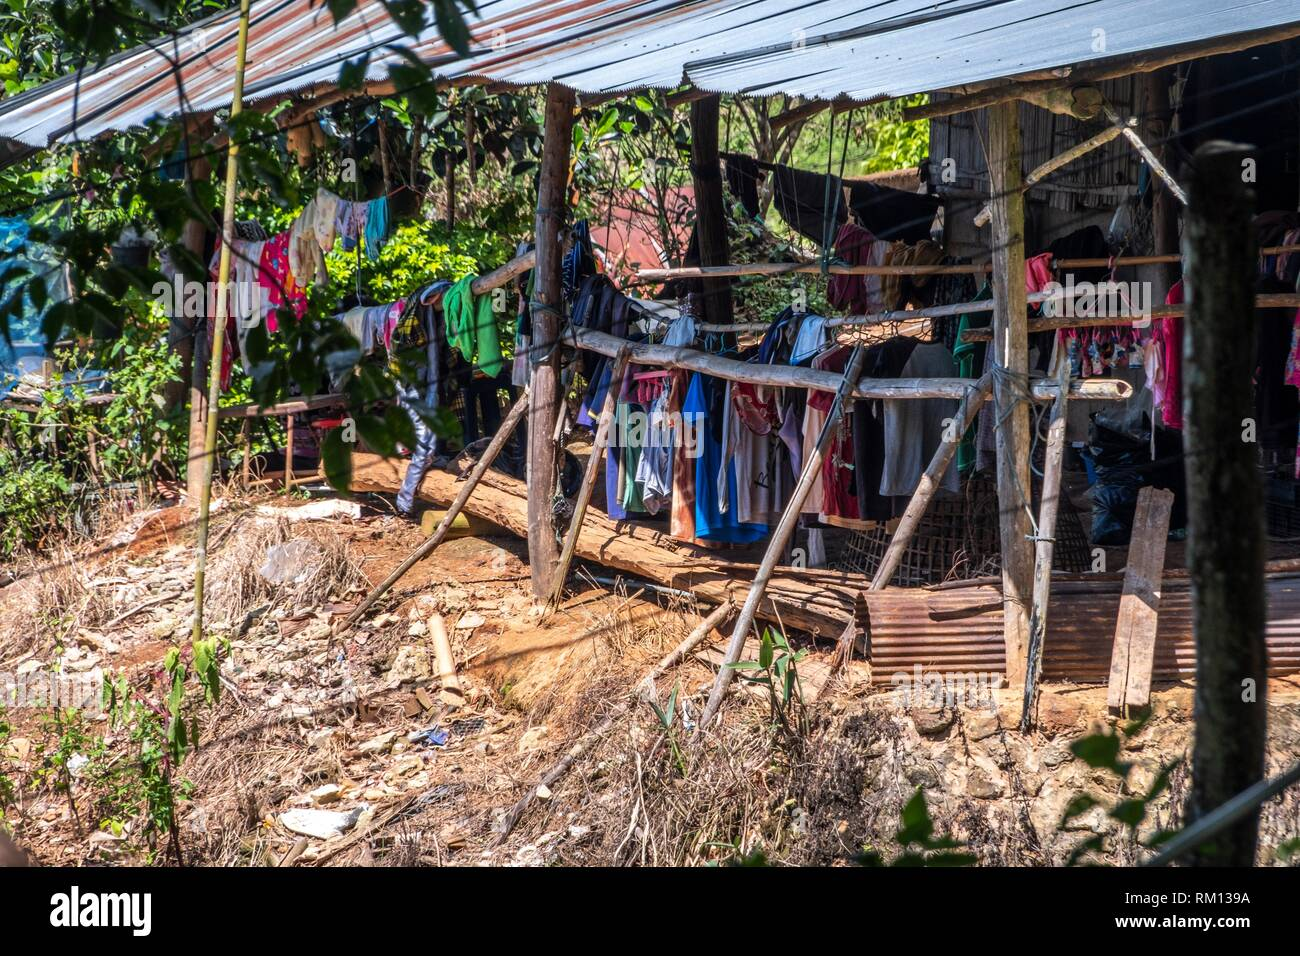 Hmong's Hilltribe Village, Doi Pui, Chiang Mai, Thailand - Stock Image